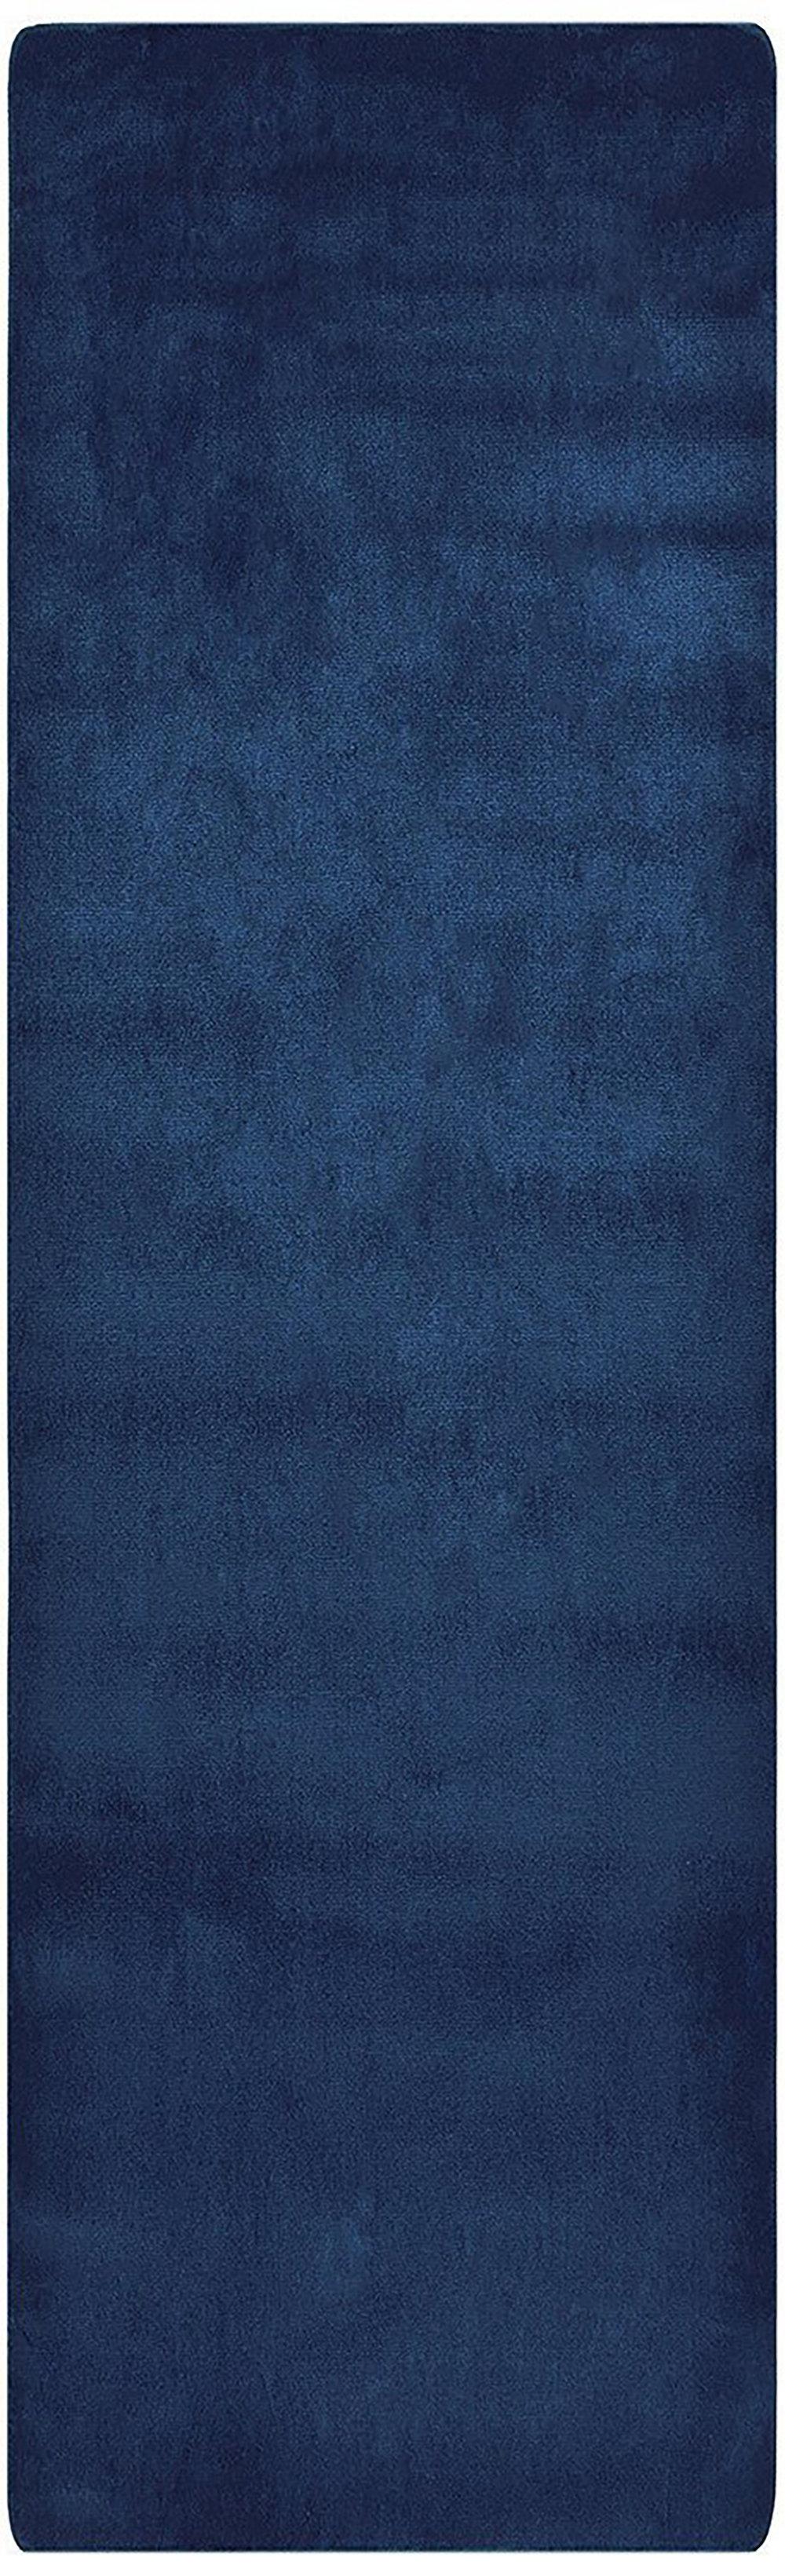 Pinkert Tufted Navy Blue Area Rug